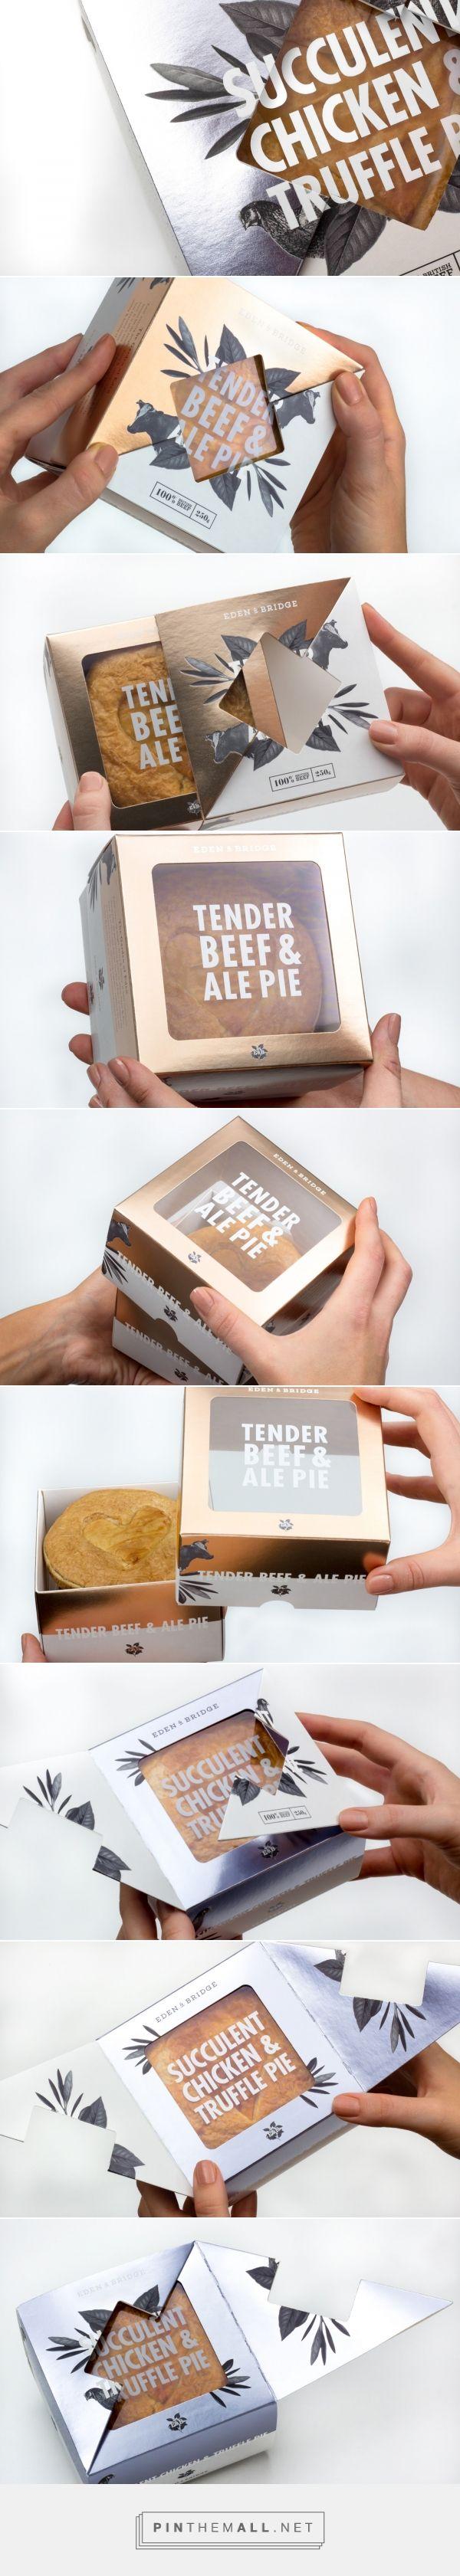 Eden & Bridge Luxury Pie packaging design by Fable&Co. (UK) - http://www.packagingoftheworld.com/2016/09/eden-bridge-luxury-pie.html